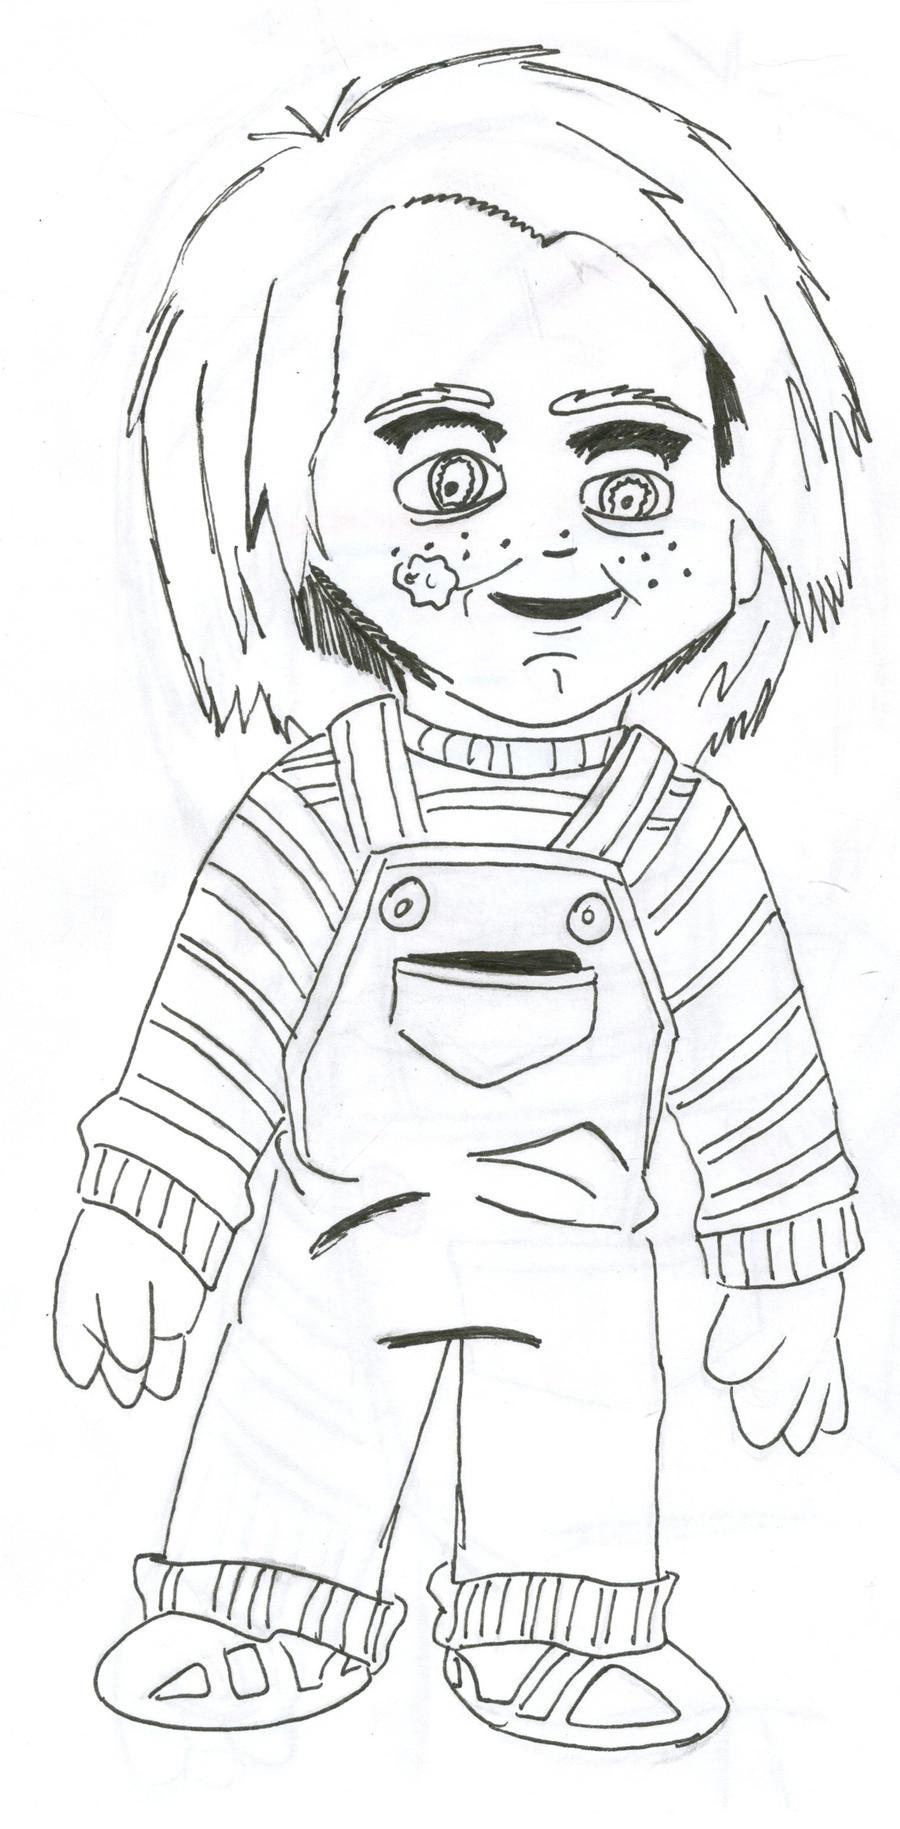 Inked Child's Play sketch by captstar1 on DeviantArt